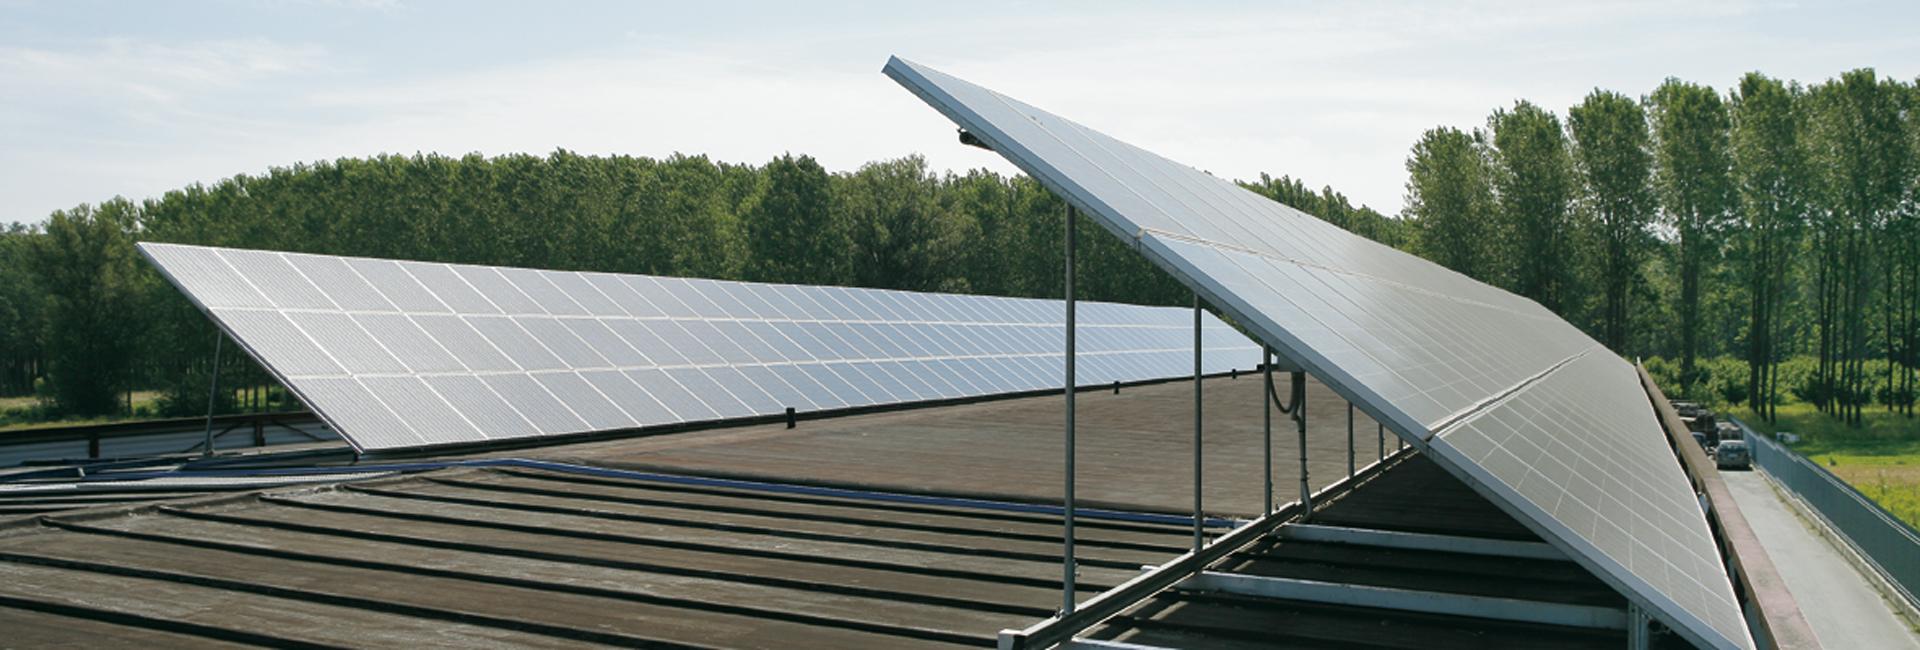 Pannelli-fotovoltaici-Nizza